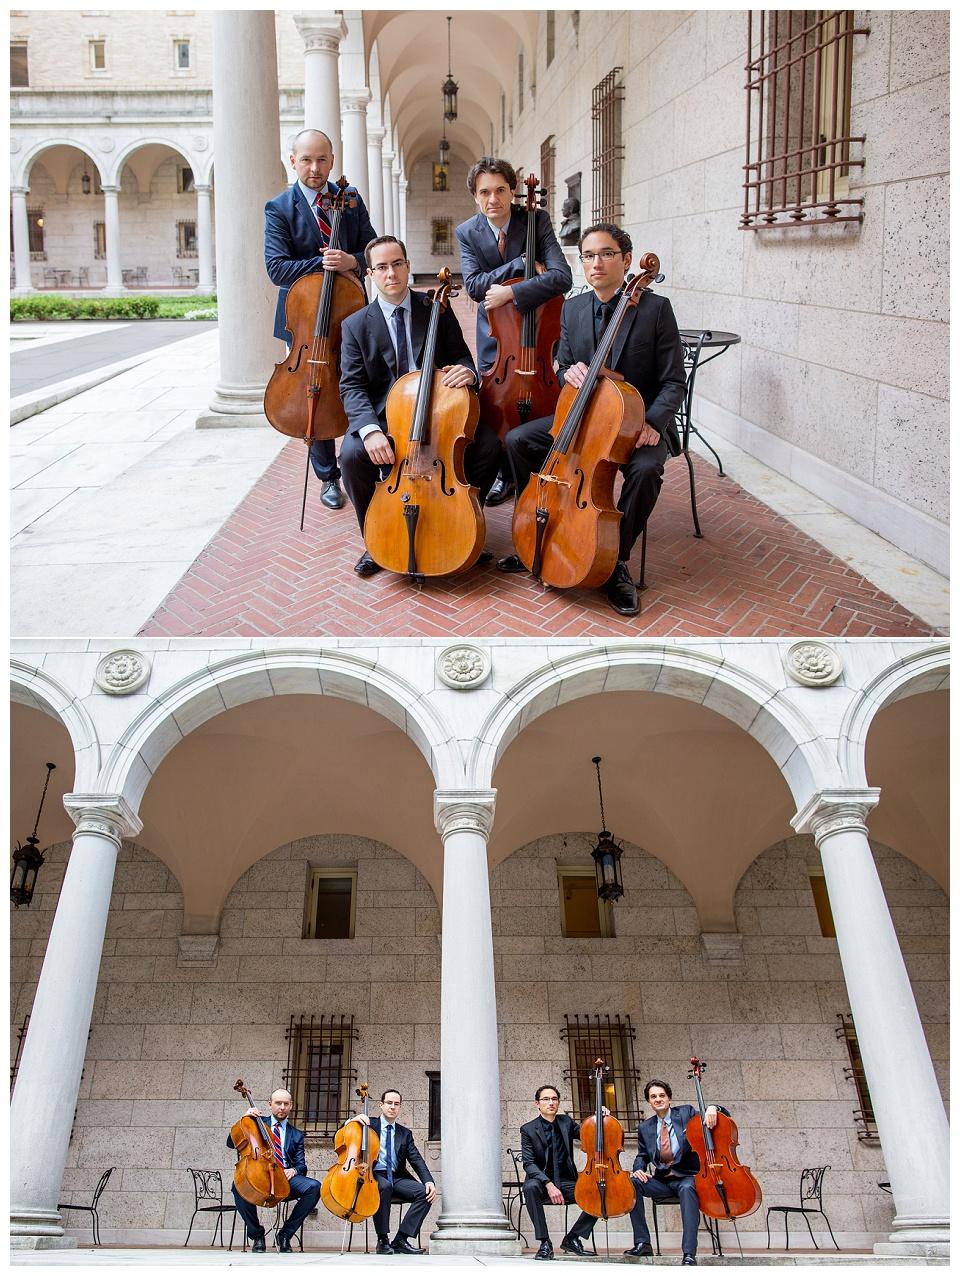 The Boston Cello Quartet's photo shoot at the courtyard of the Boston Public Library in Back Bay. Boston headshot photographer.